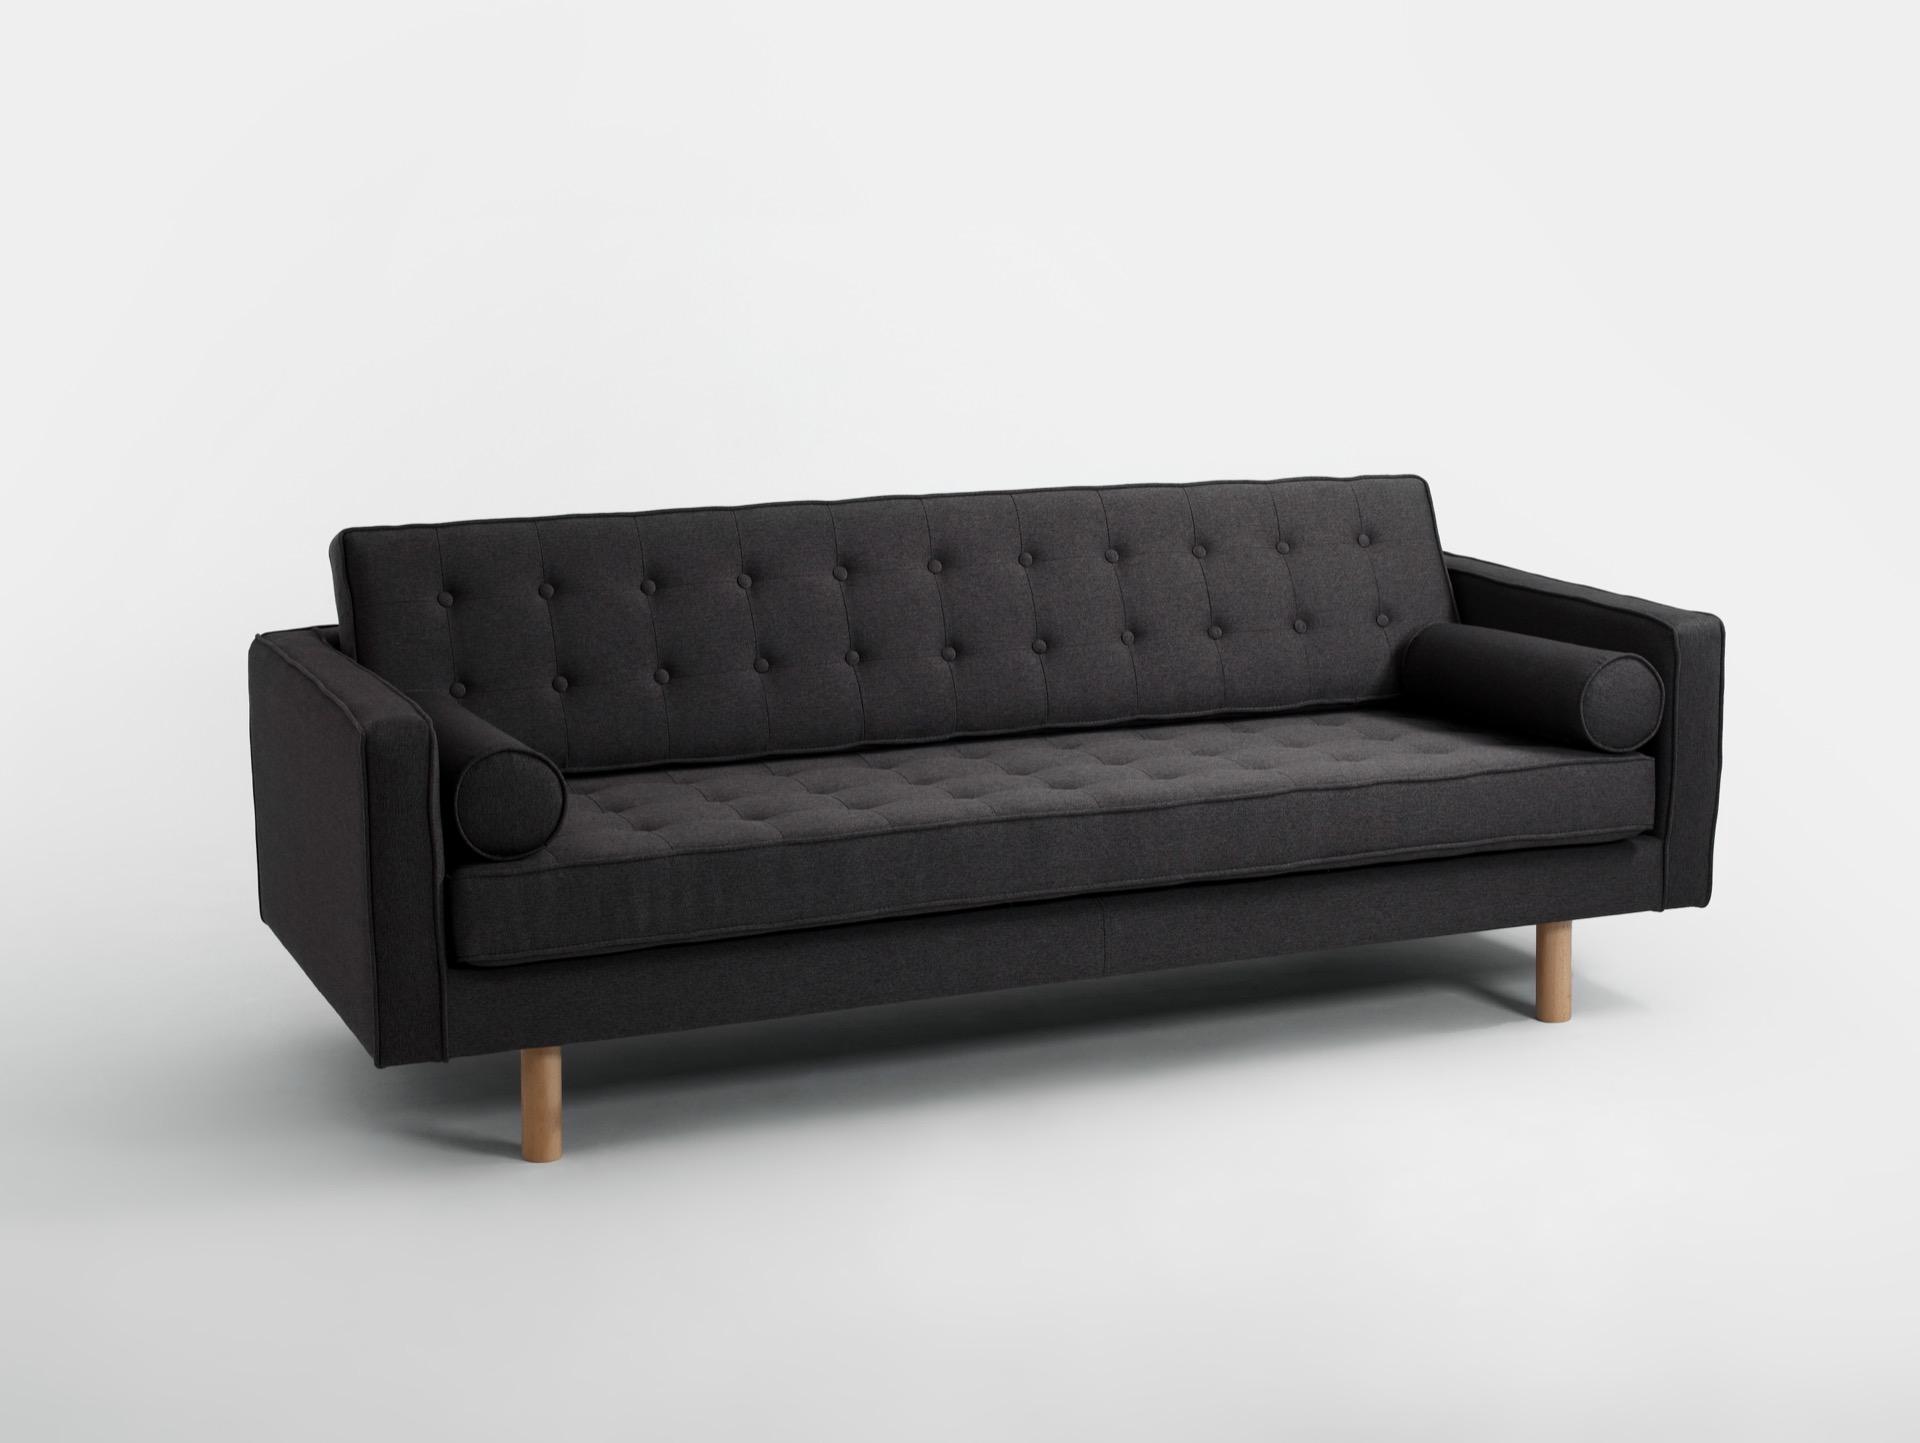 3-Sitzer Sofa TOPIC Holz